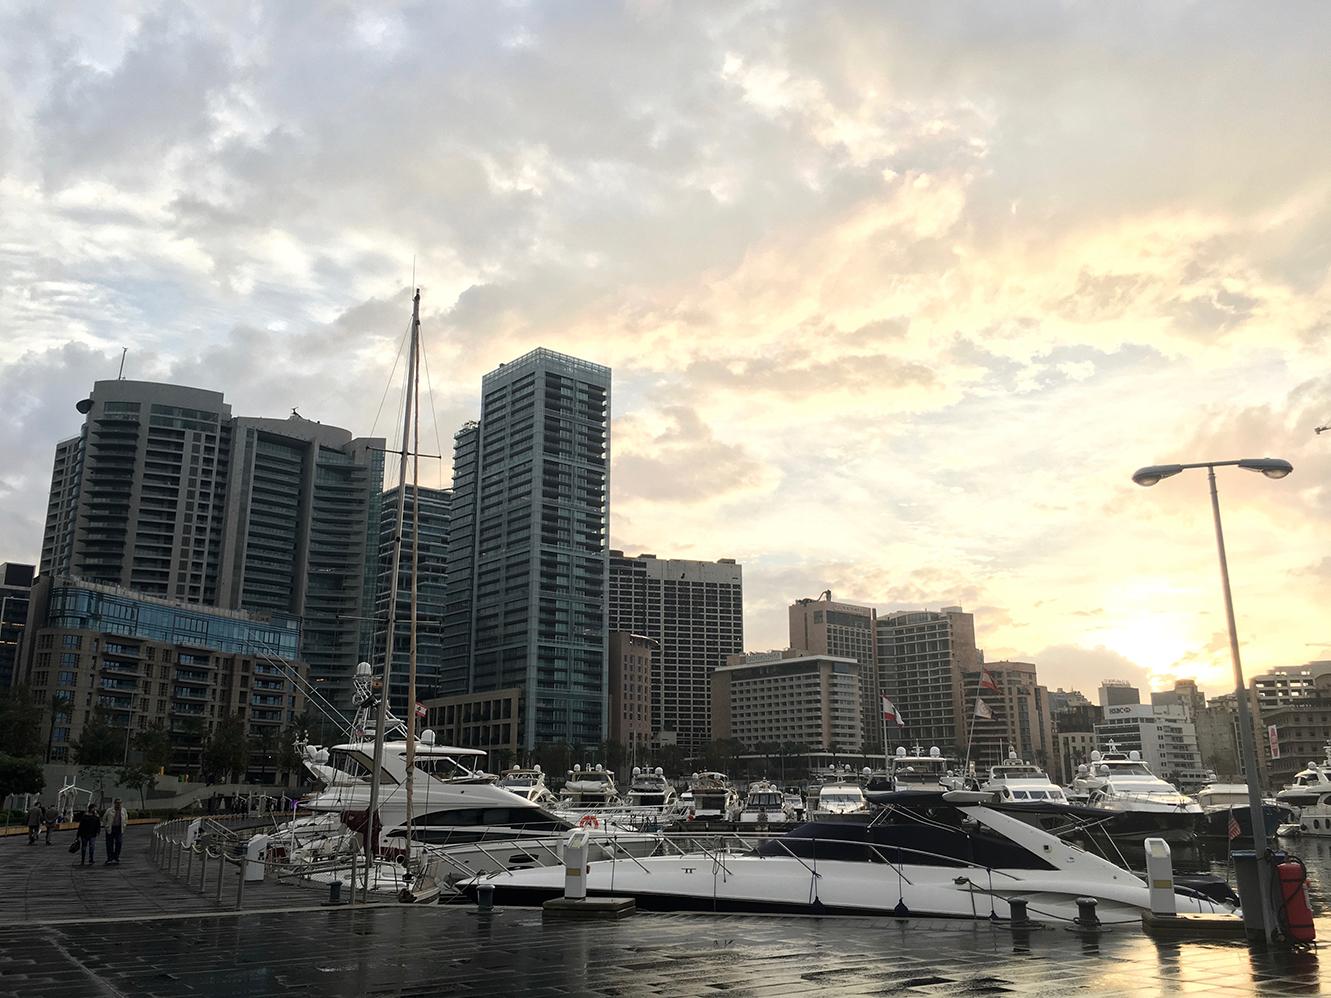 Zaitunay Bay yacht marina Beirut Lebanon